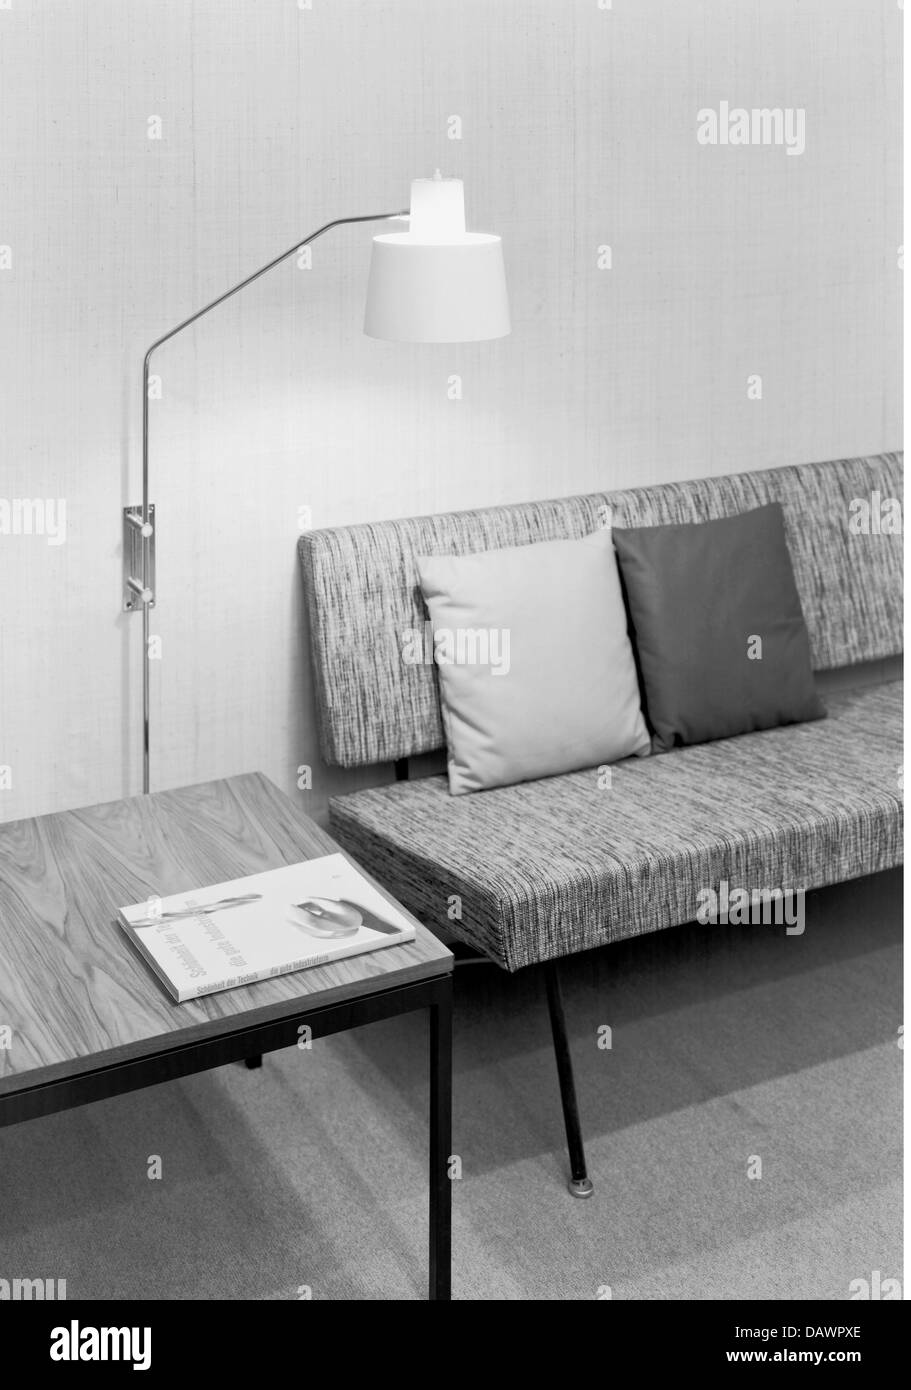 1960 1960s Stock Photos & 1960 1960s Stock Images - Alamy